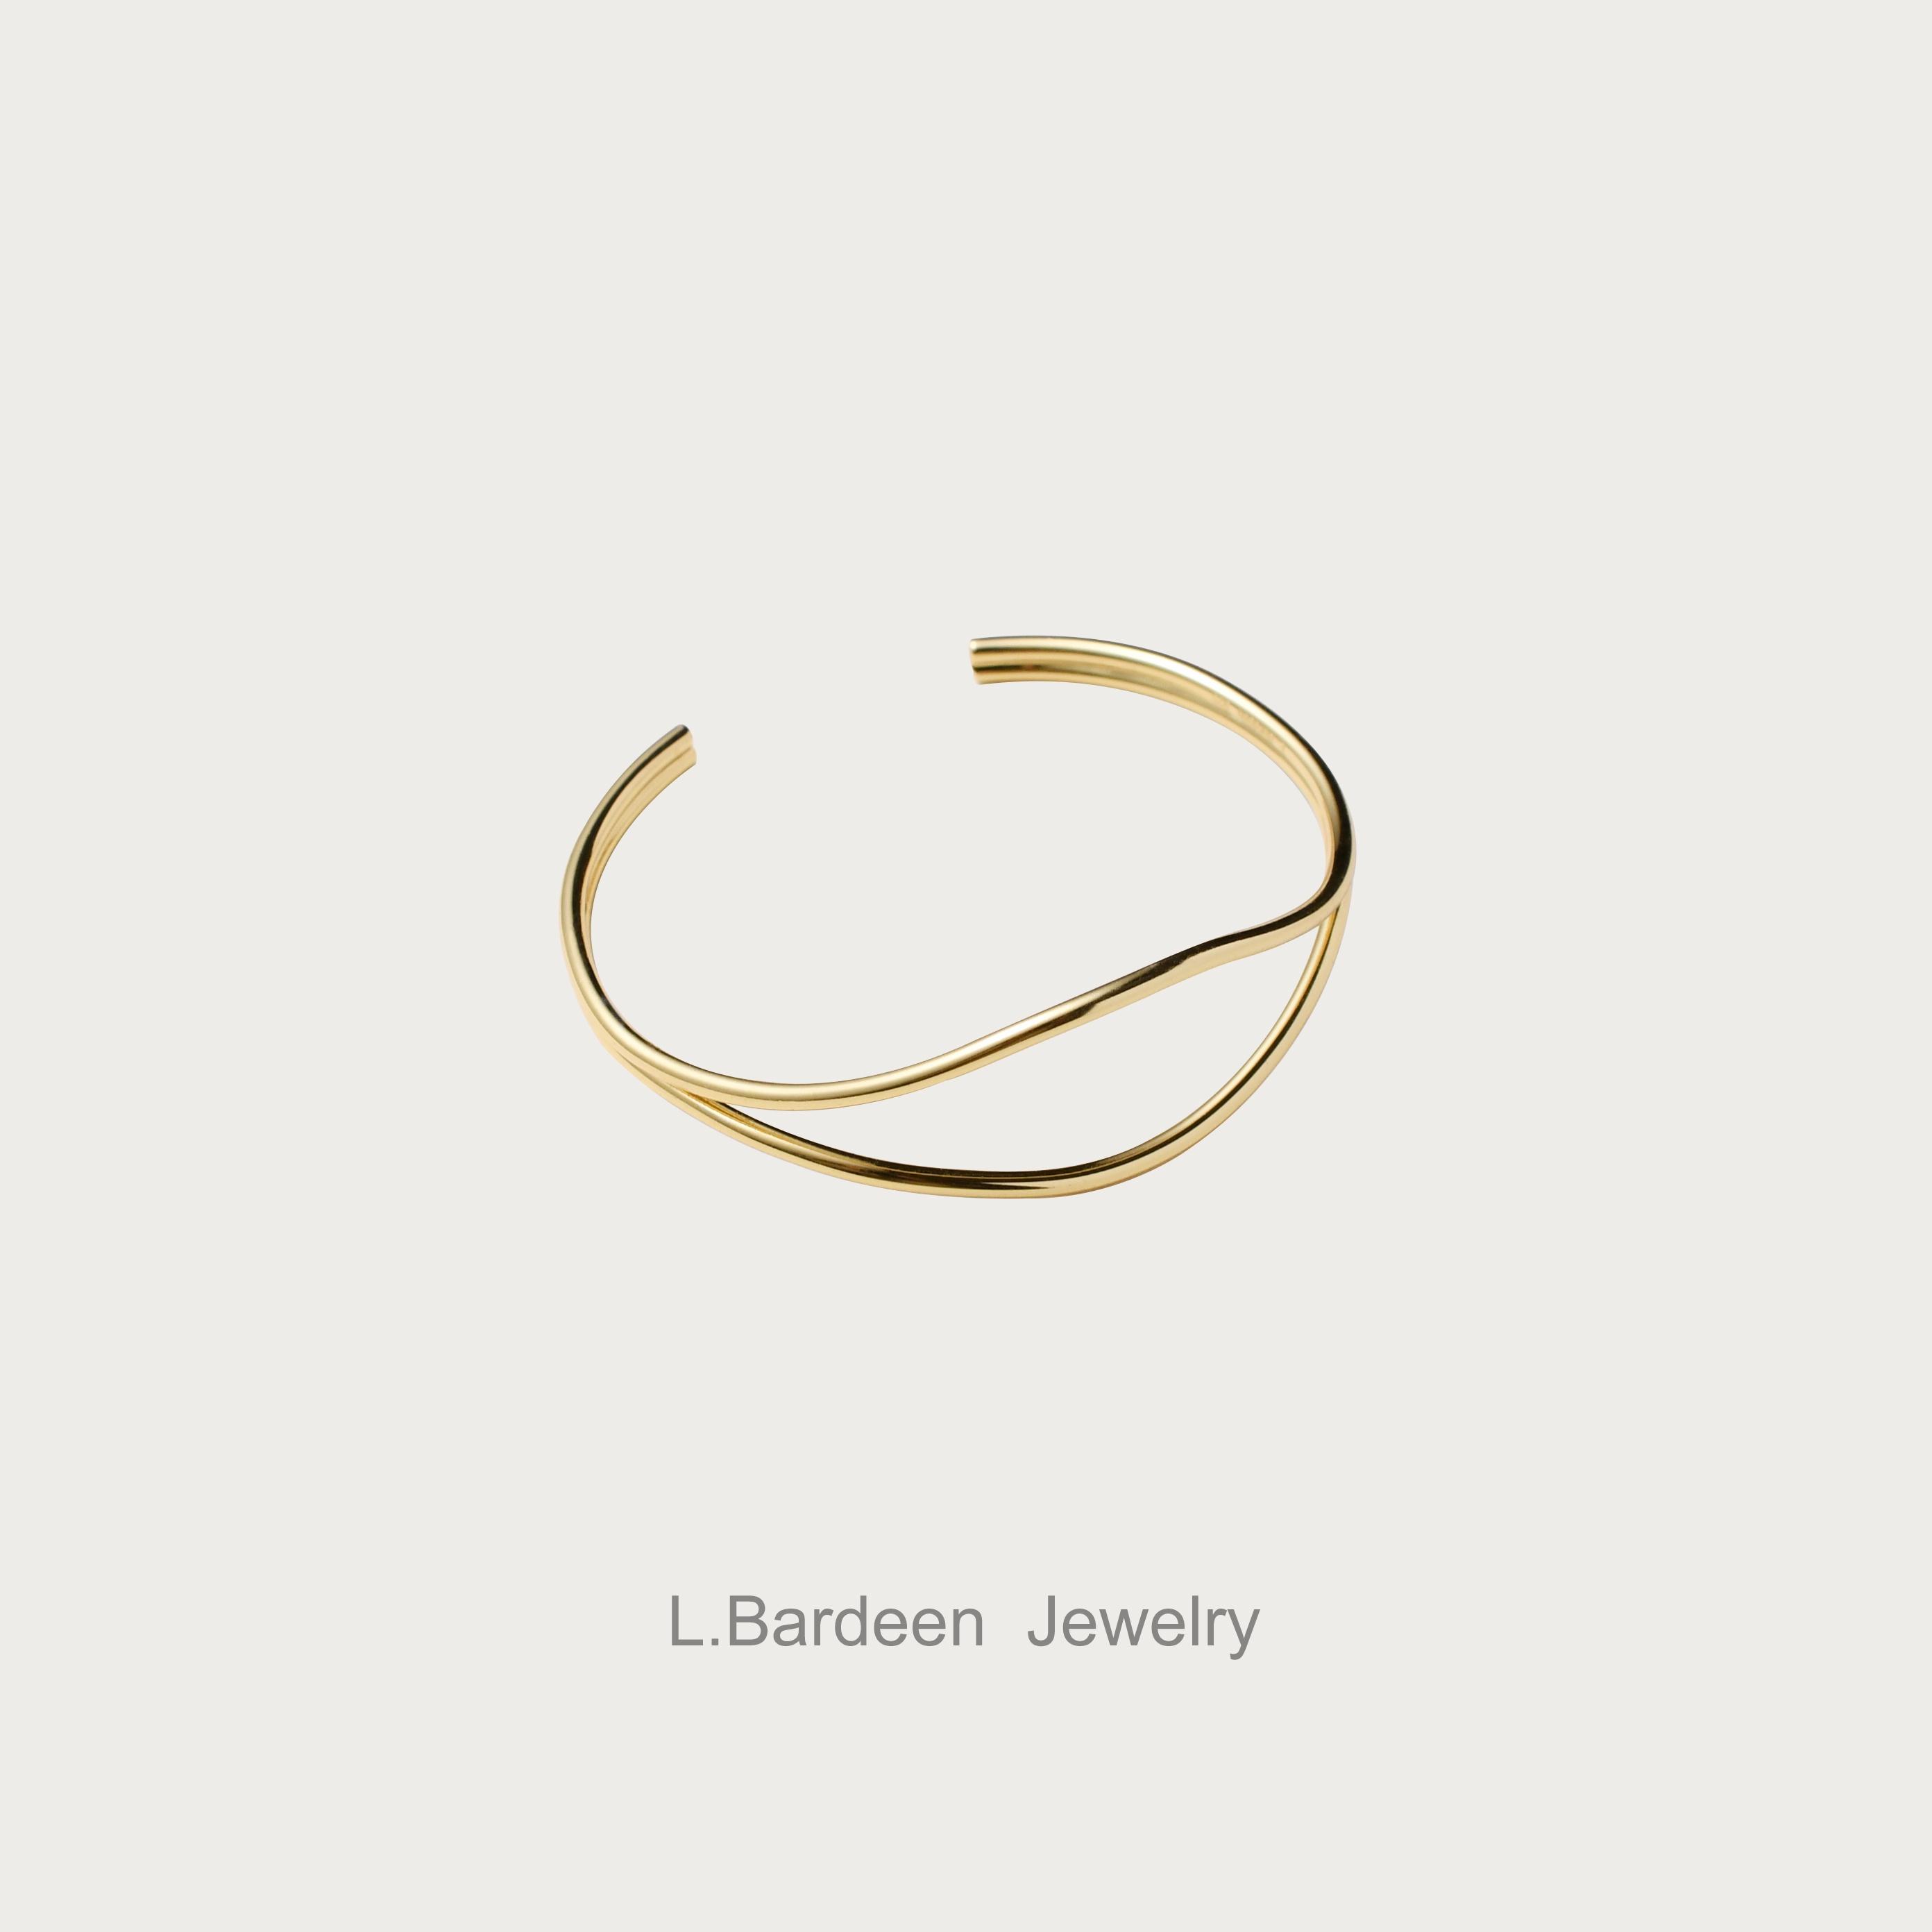 New L. Bardeen pure silver bracelet simple Bracelet Gold temperament retro geometry original niche design